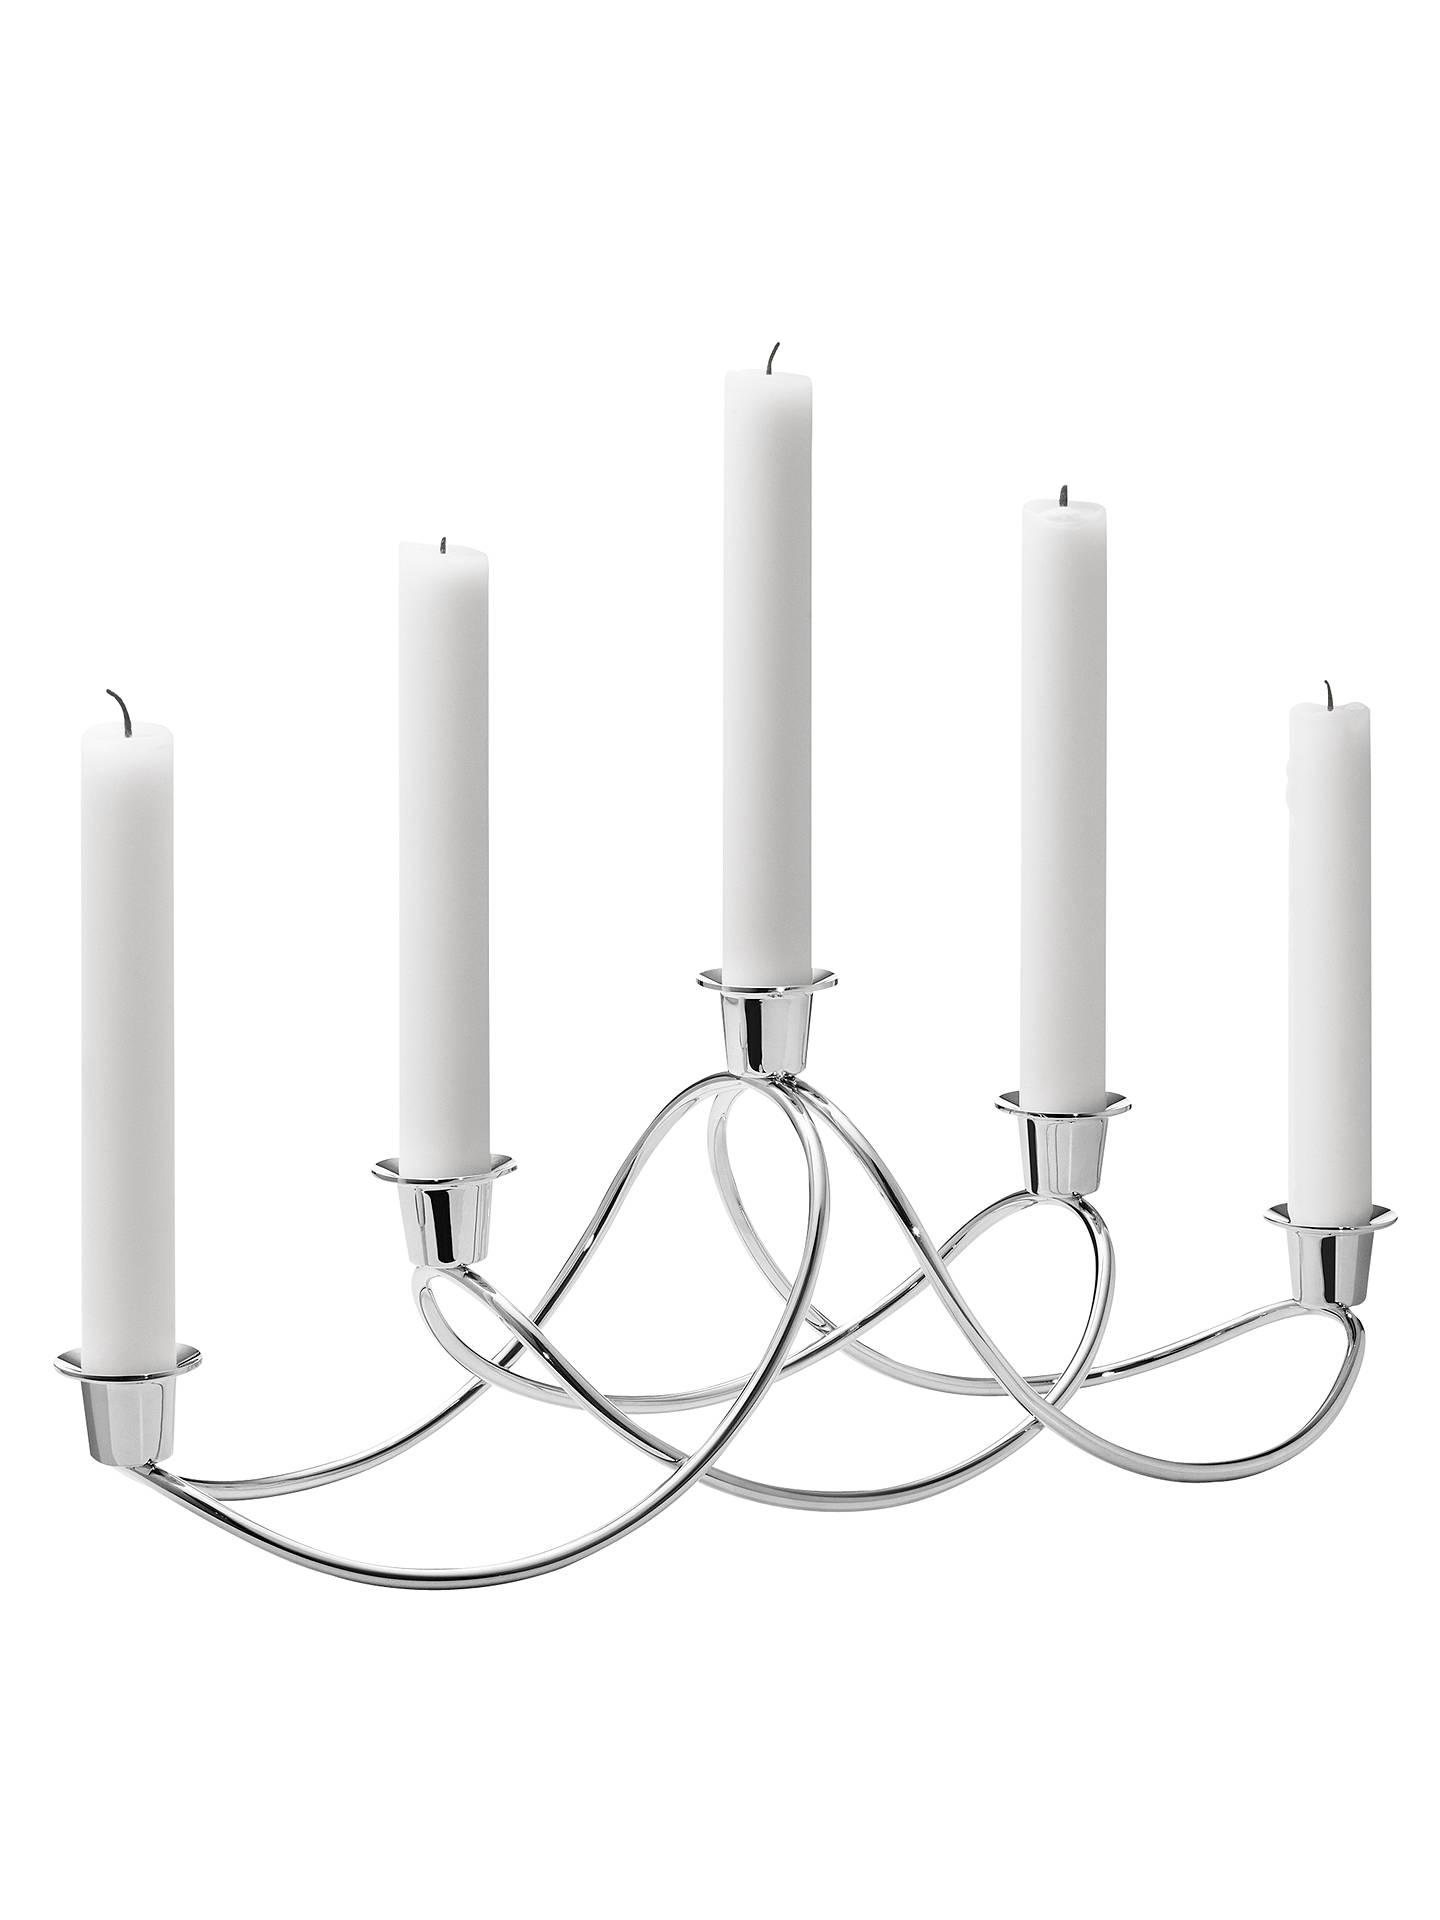 Buygeorg jensen harmony candlestick holder online at johnlewis com